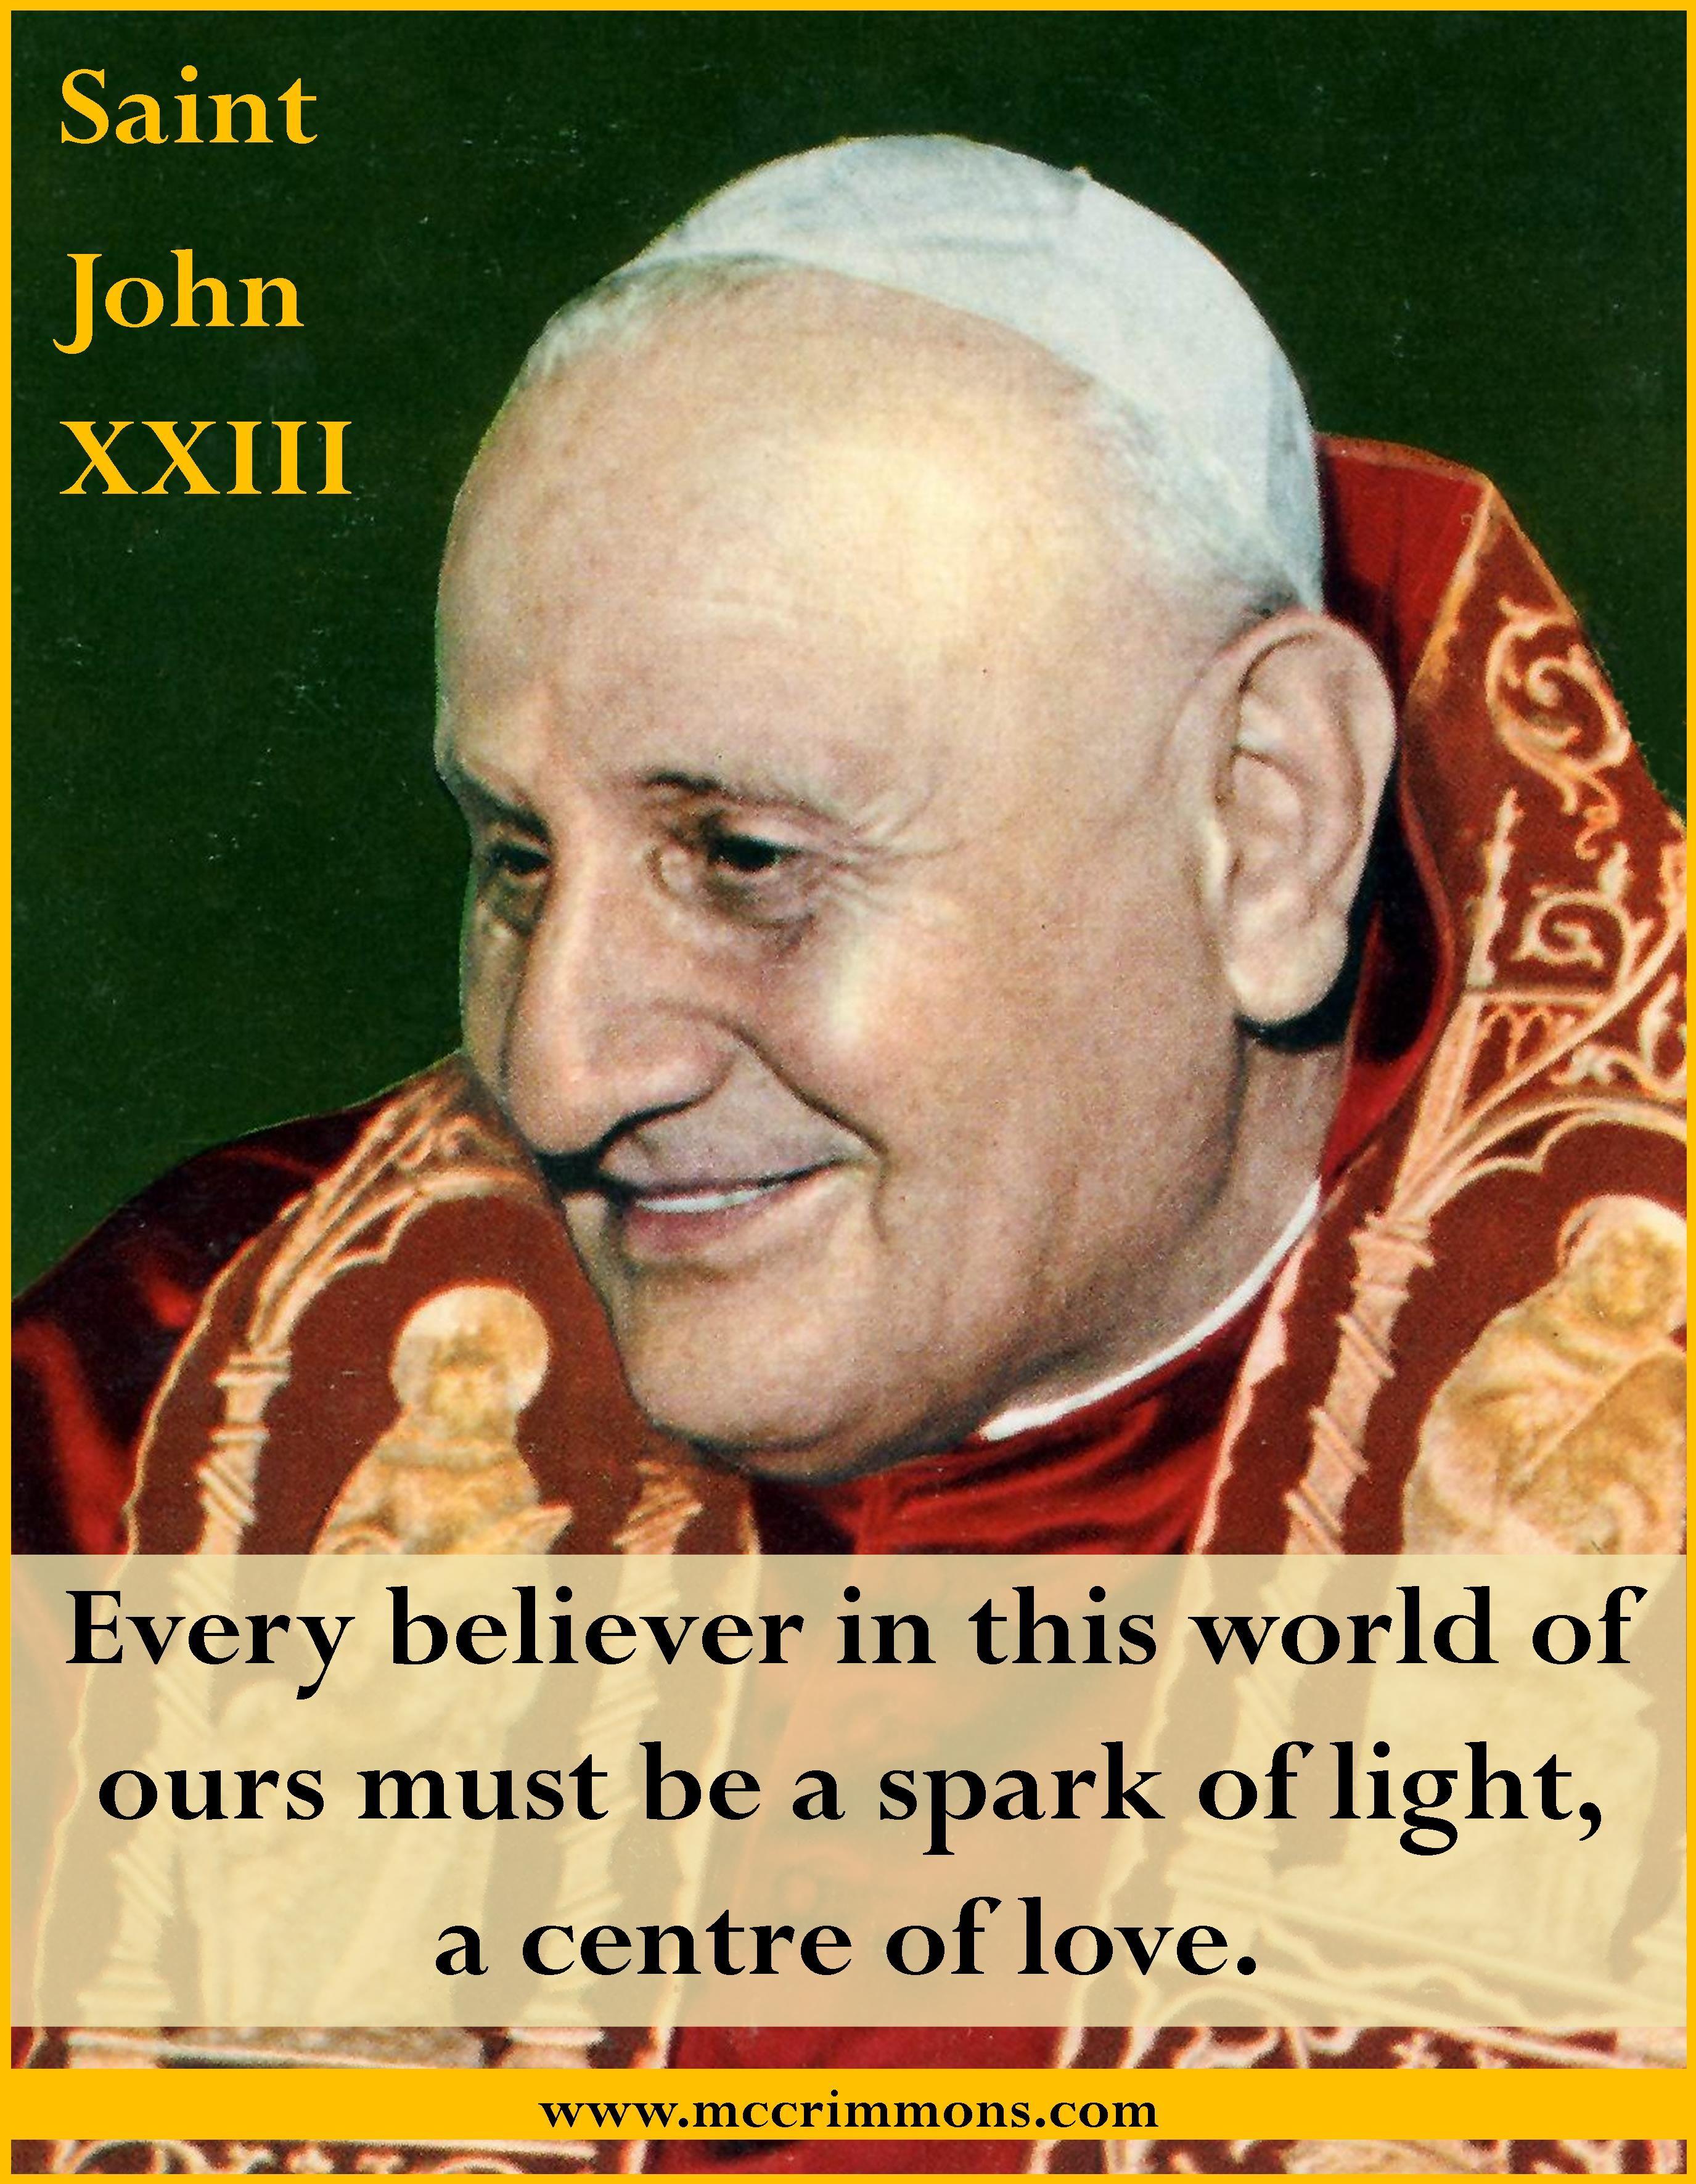 Be the light stjohnxxiii pope john pope catholic